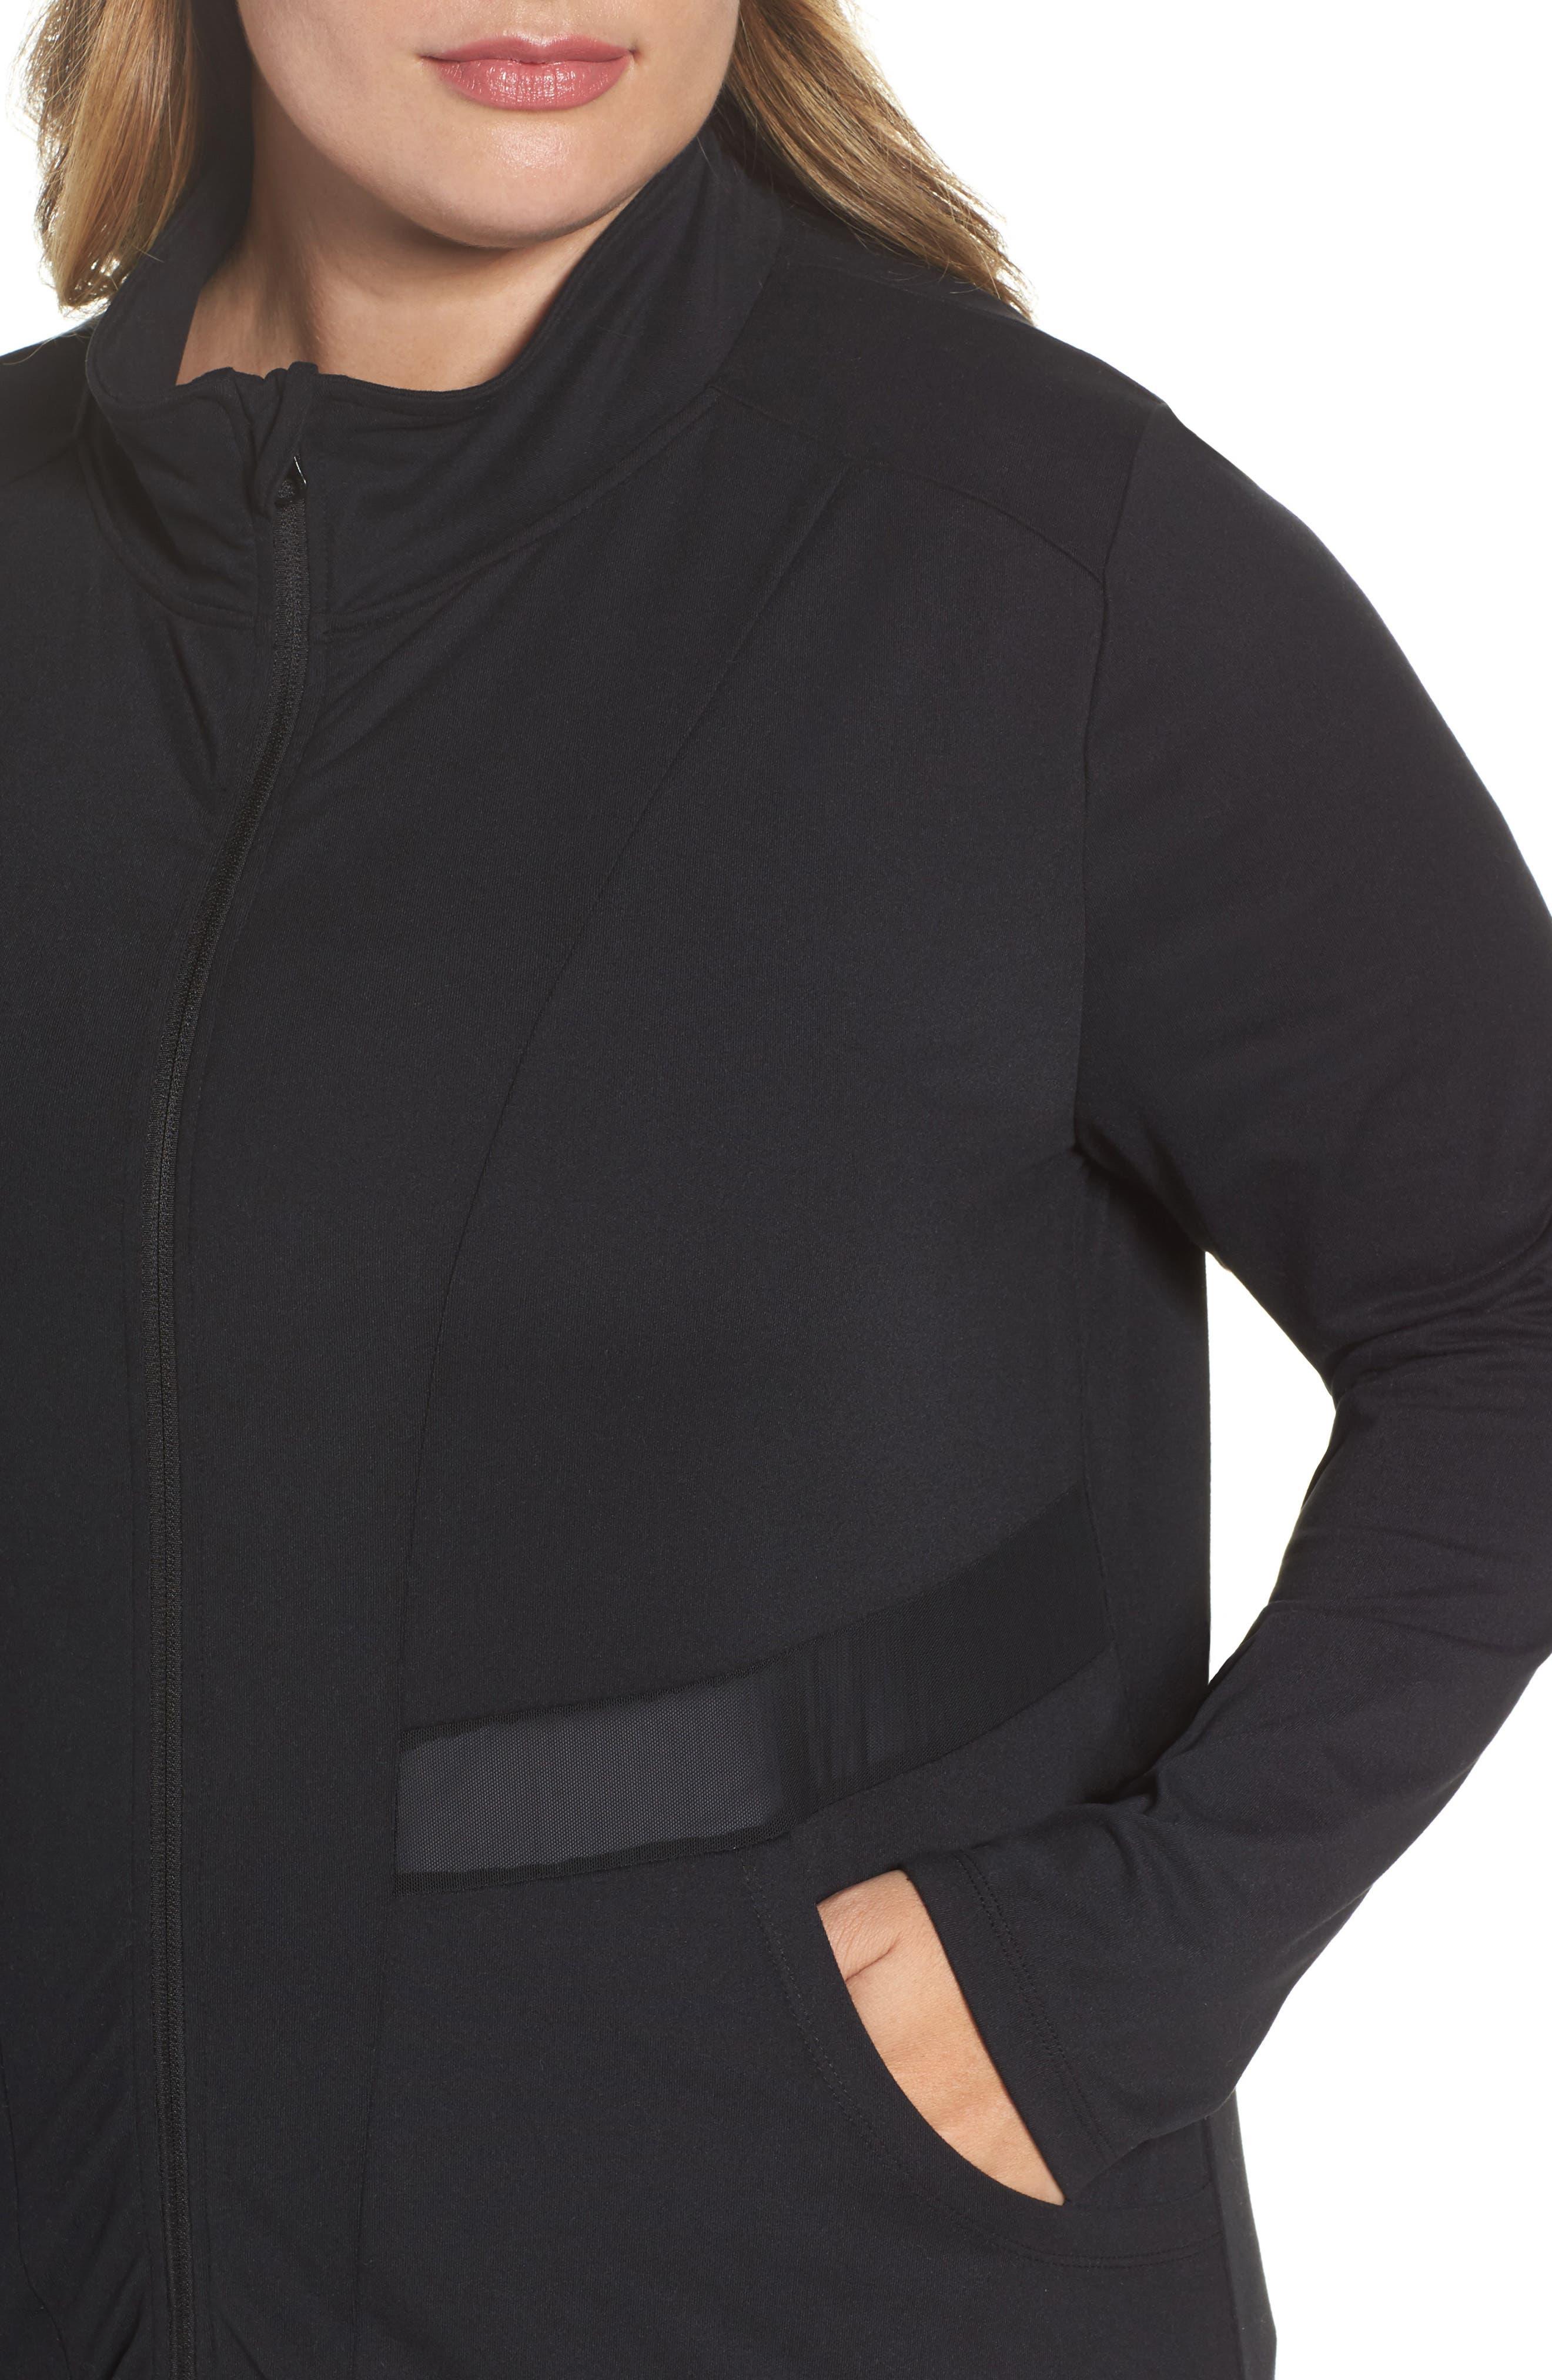 Adrenaline Jacket,                             Alternate thumbnail 6, color,                             001-Black